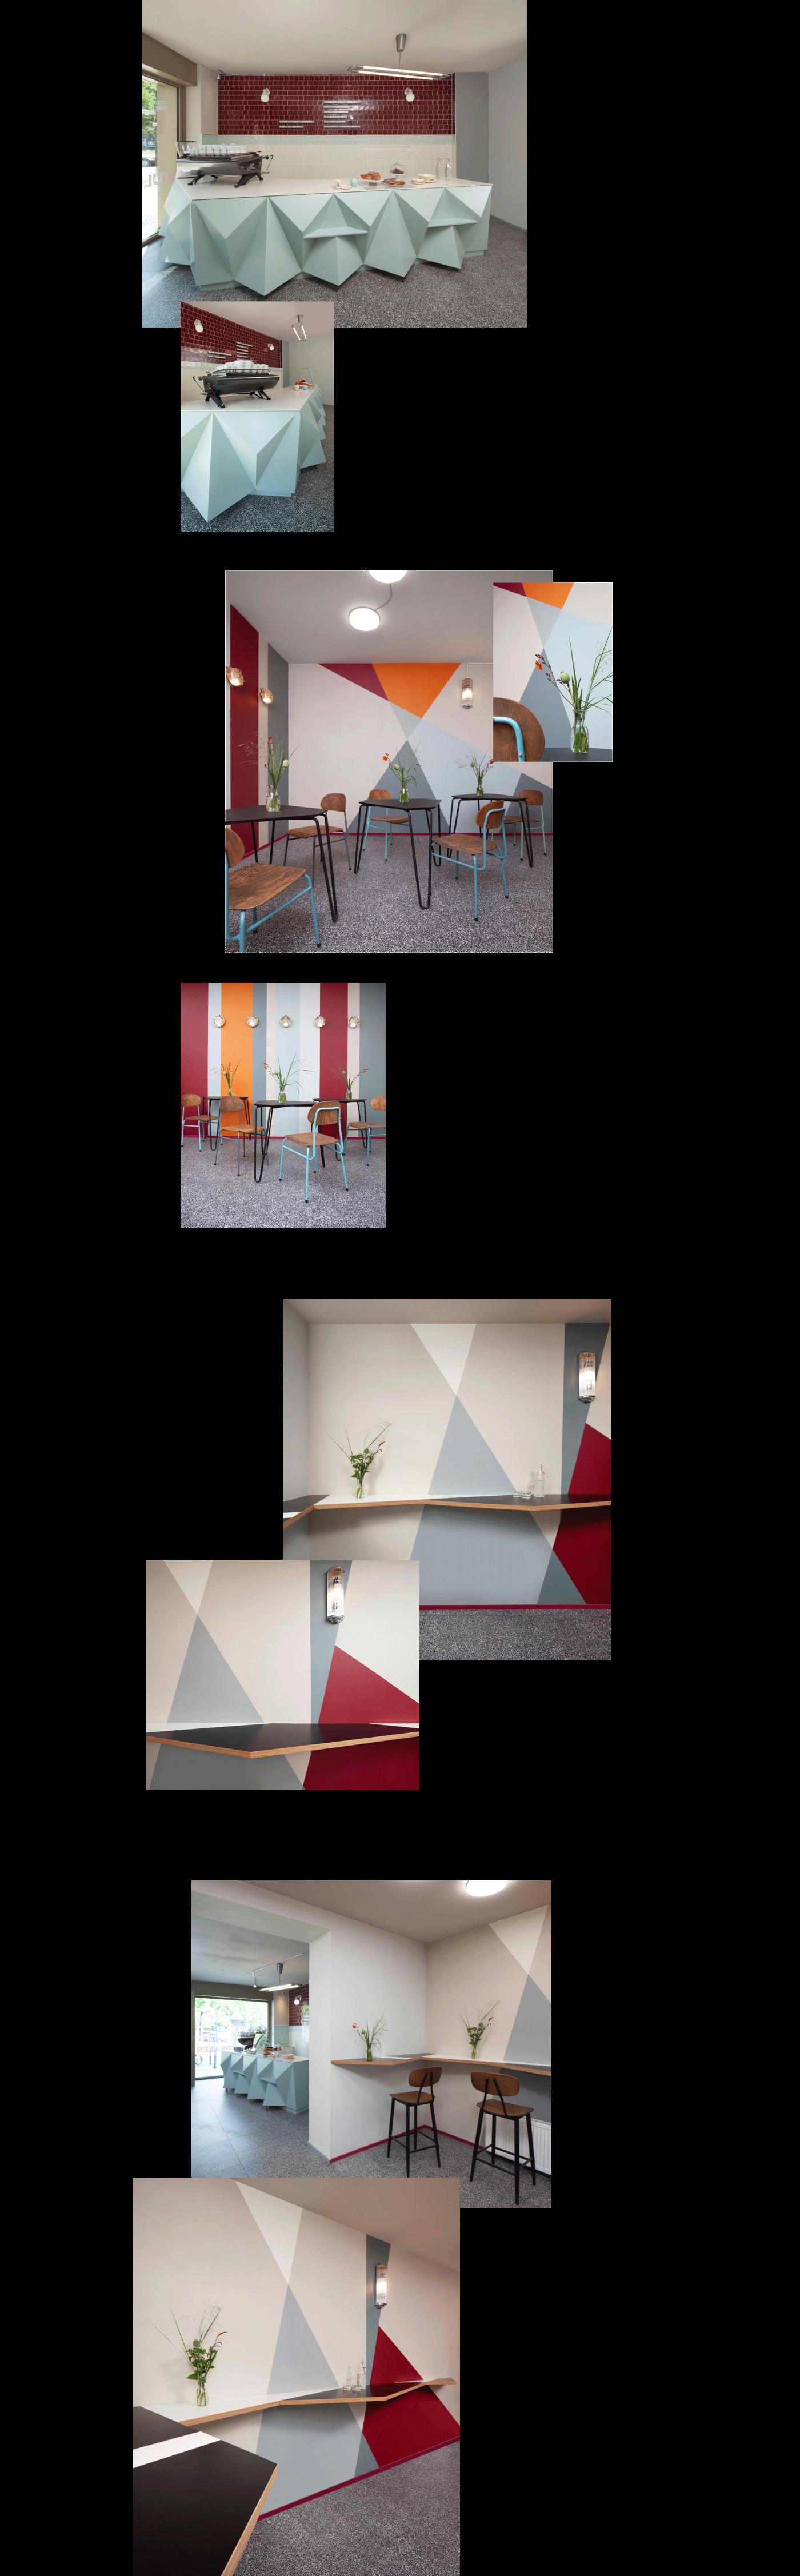 Galerie-Stullendealer-Design-by-harry-clark